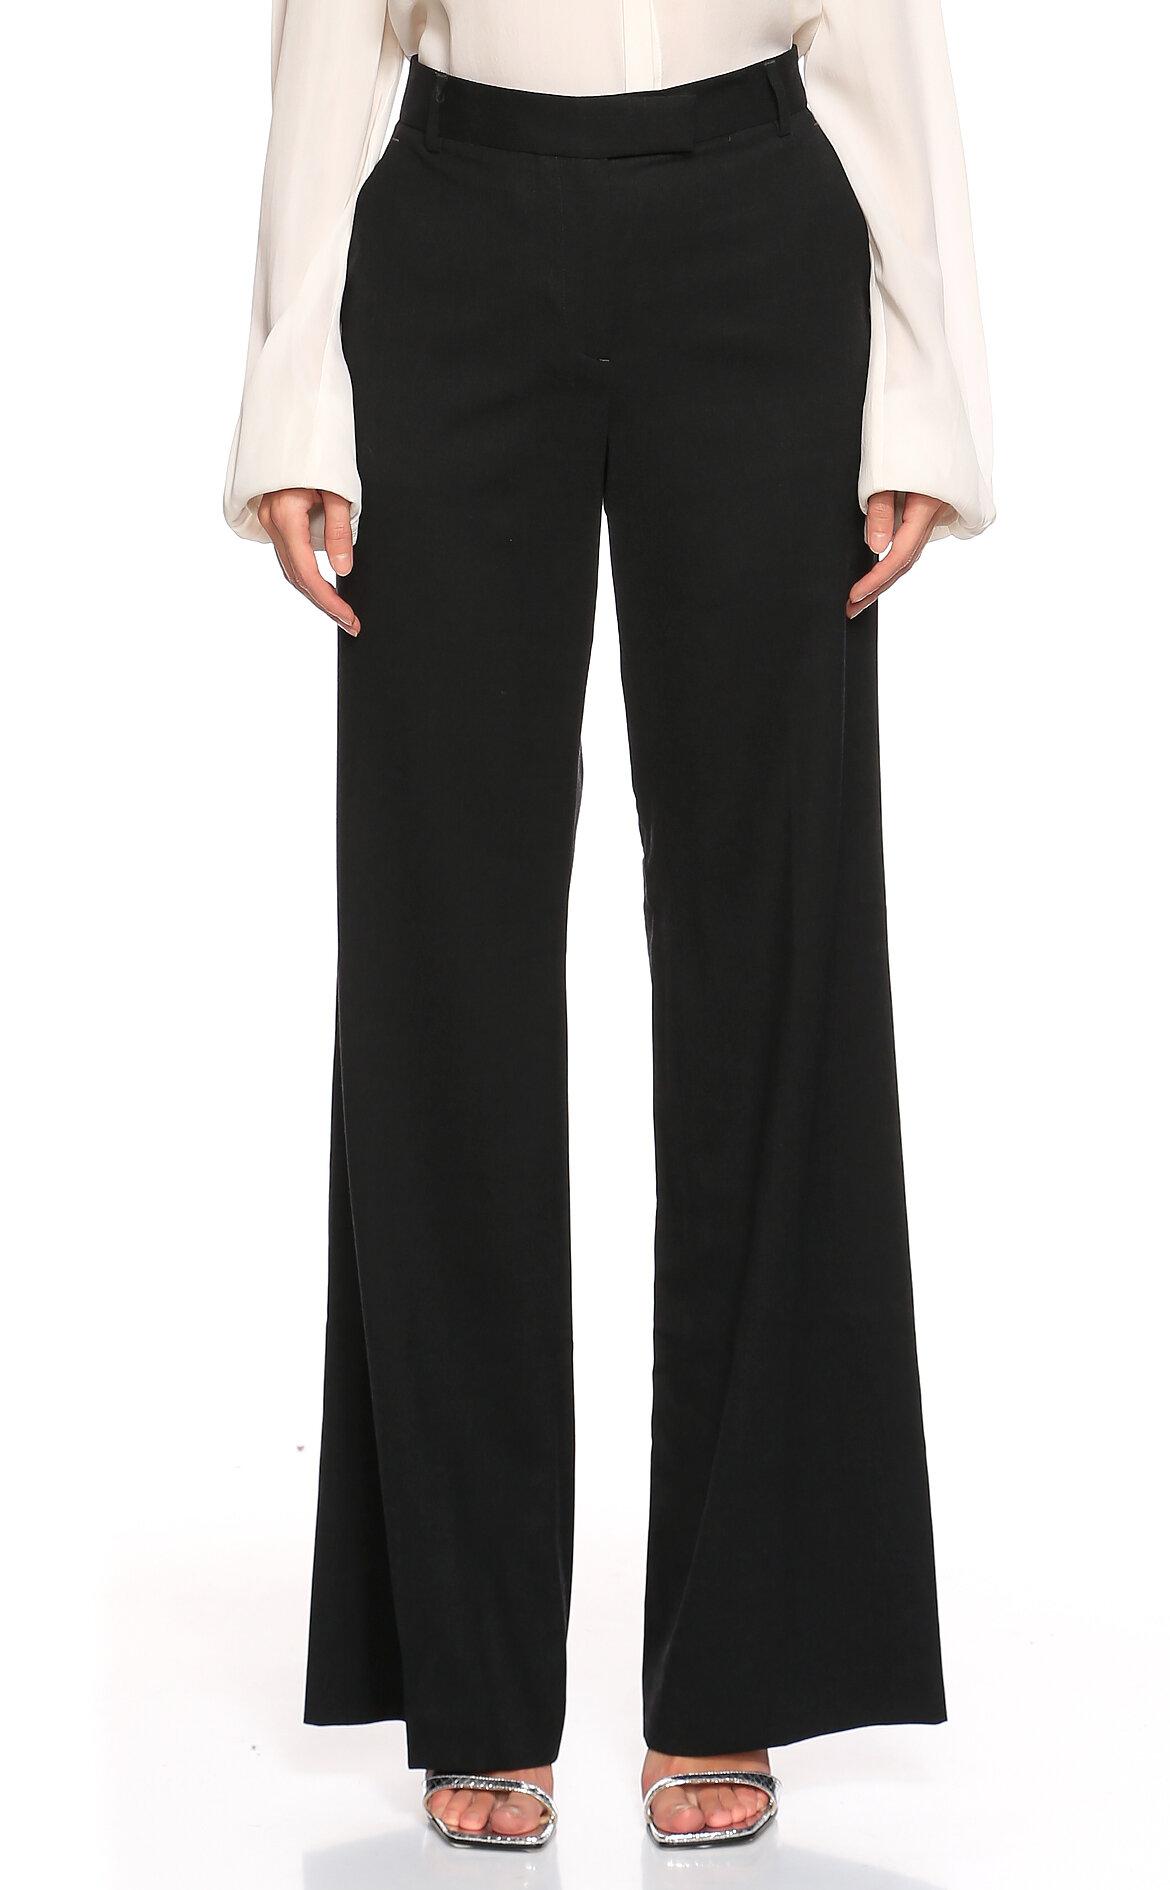 Nicole Farhi  Geniş Kesim Siyah Pantolon